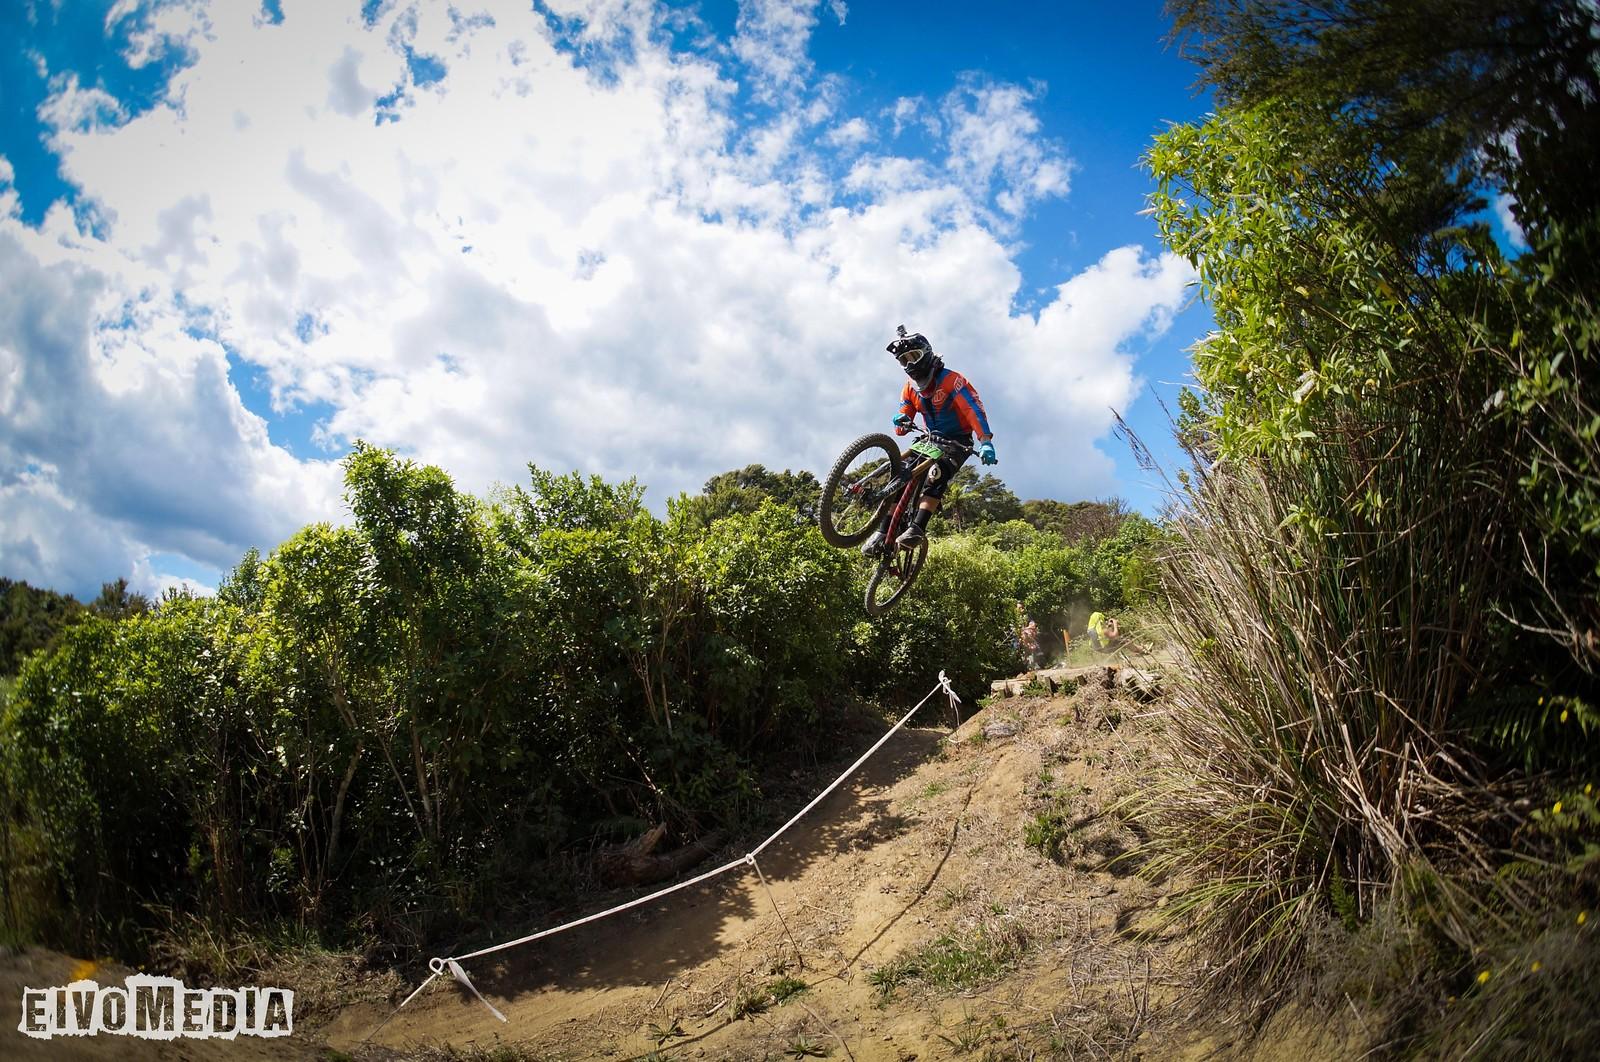 Hunua DH-2 - EIVOMEDIA - Mountain Biking Pictures - Vital MTB